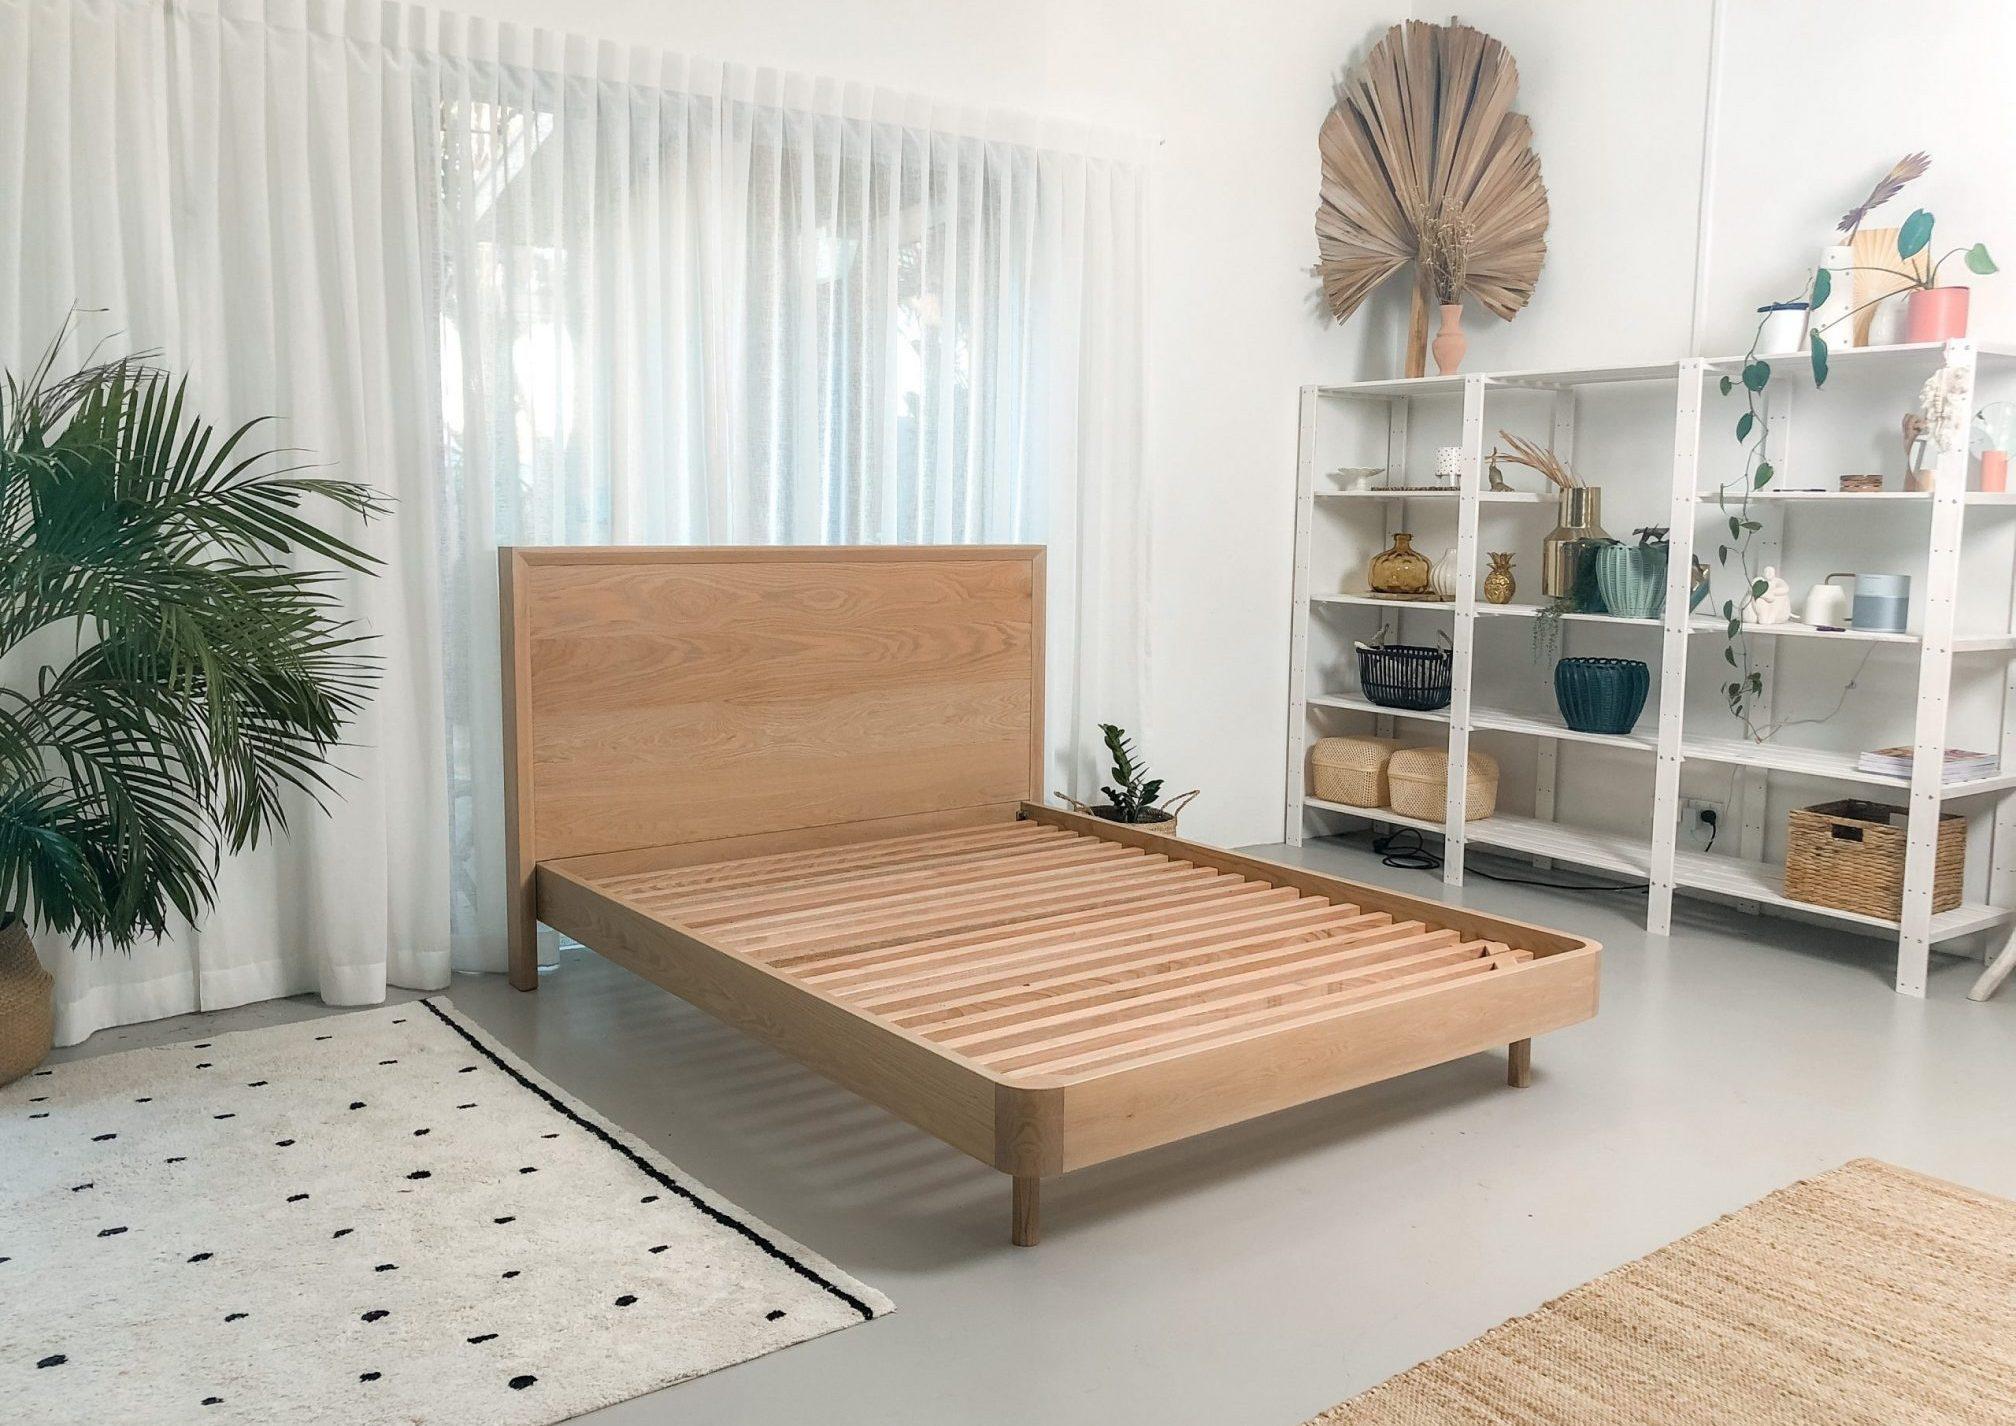 Custom timber bed